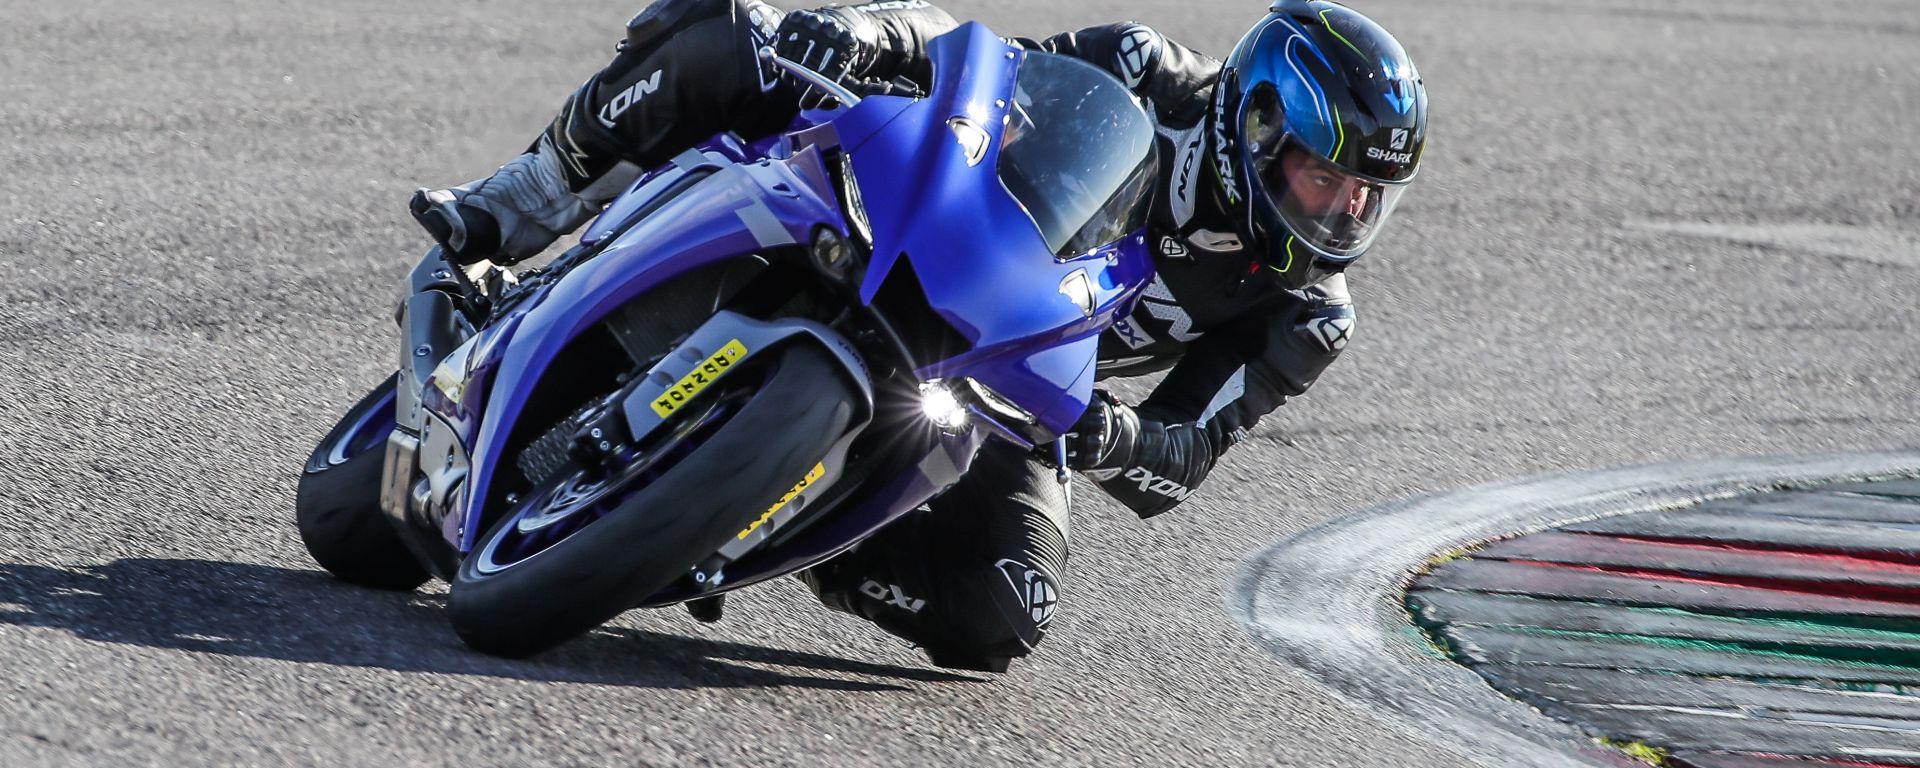 Yamaha YZF-R1 2020: la prova in pista